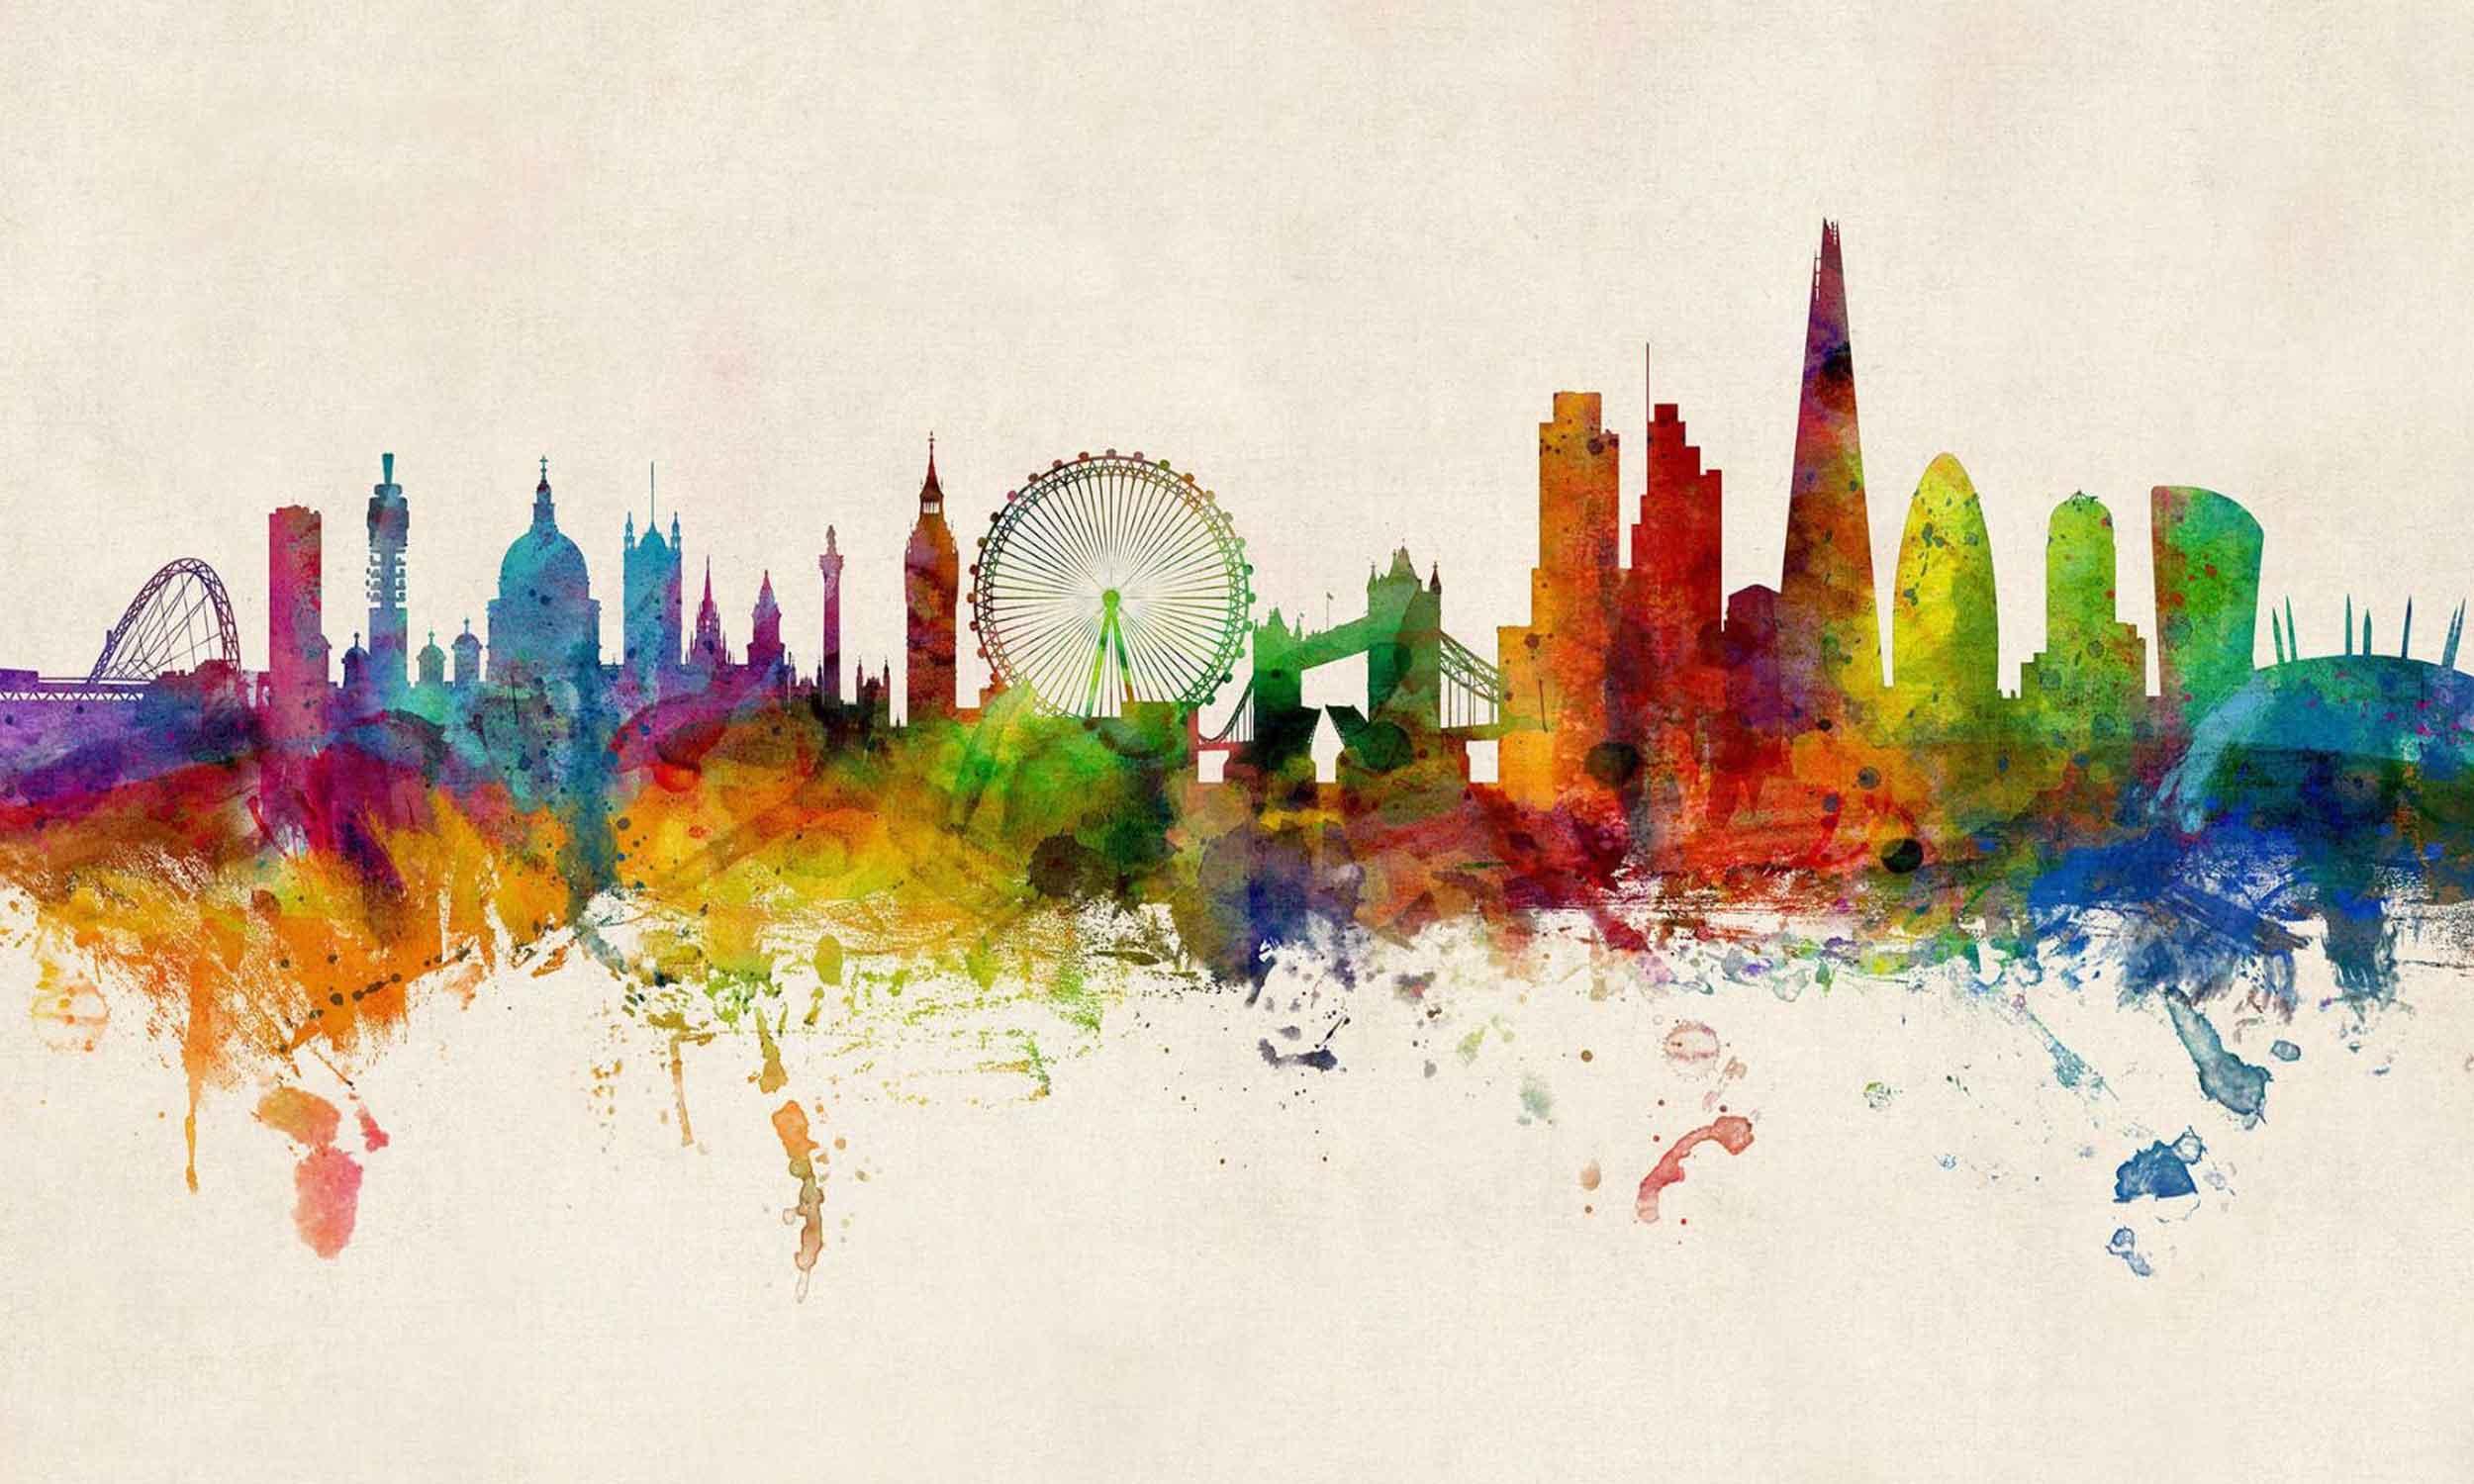 london landmarks background wallpaper mak creates Website image 2500x1500